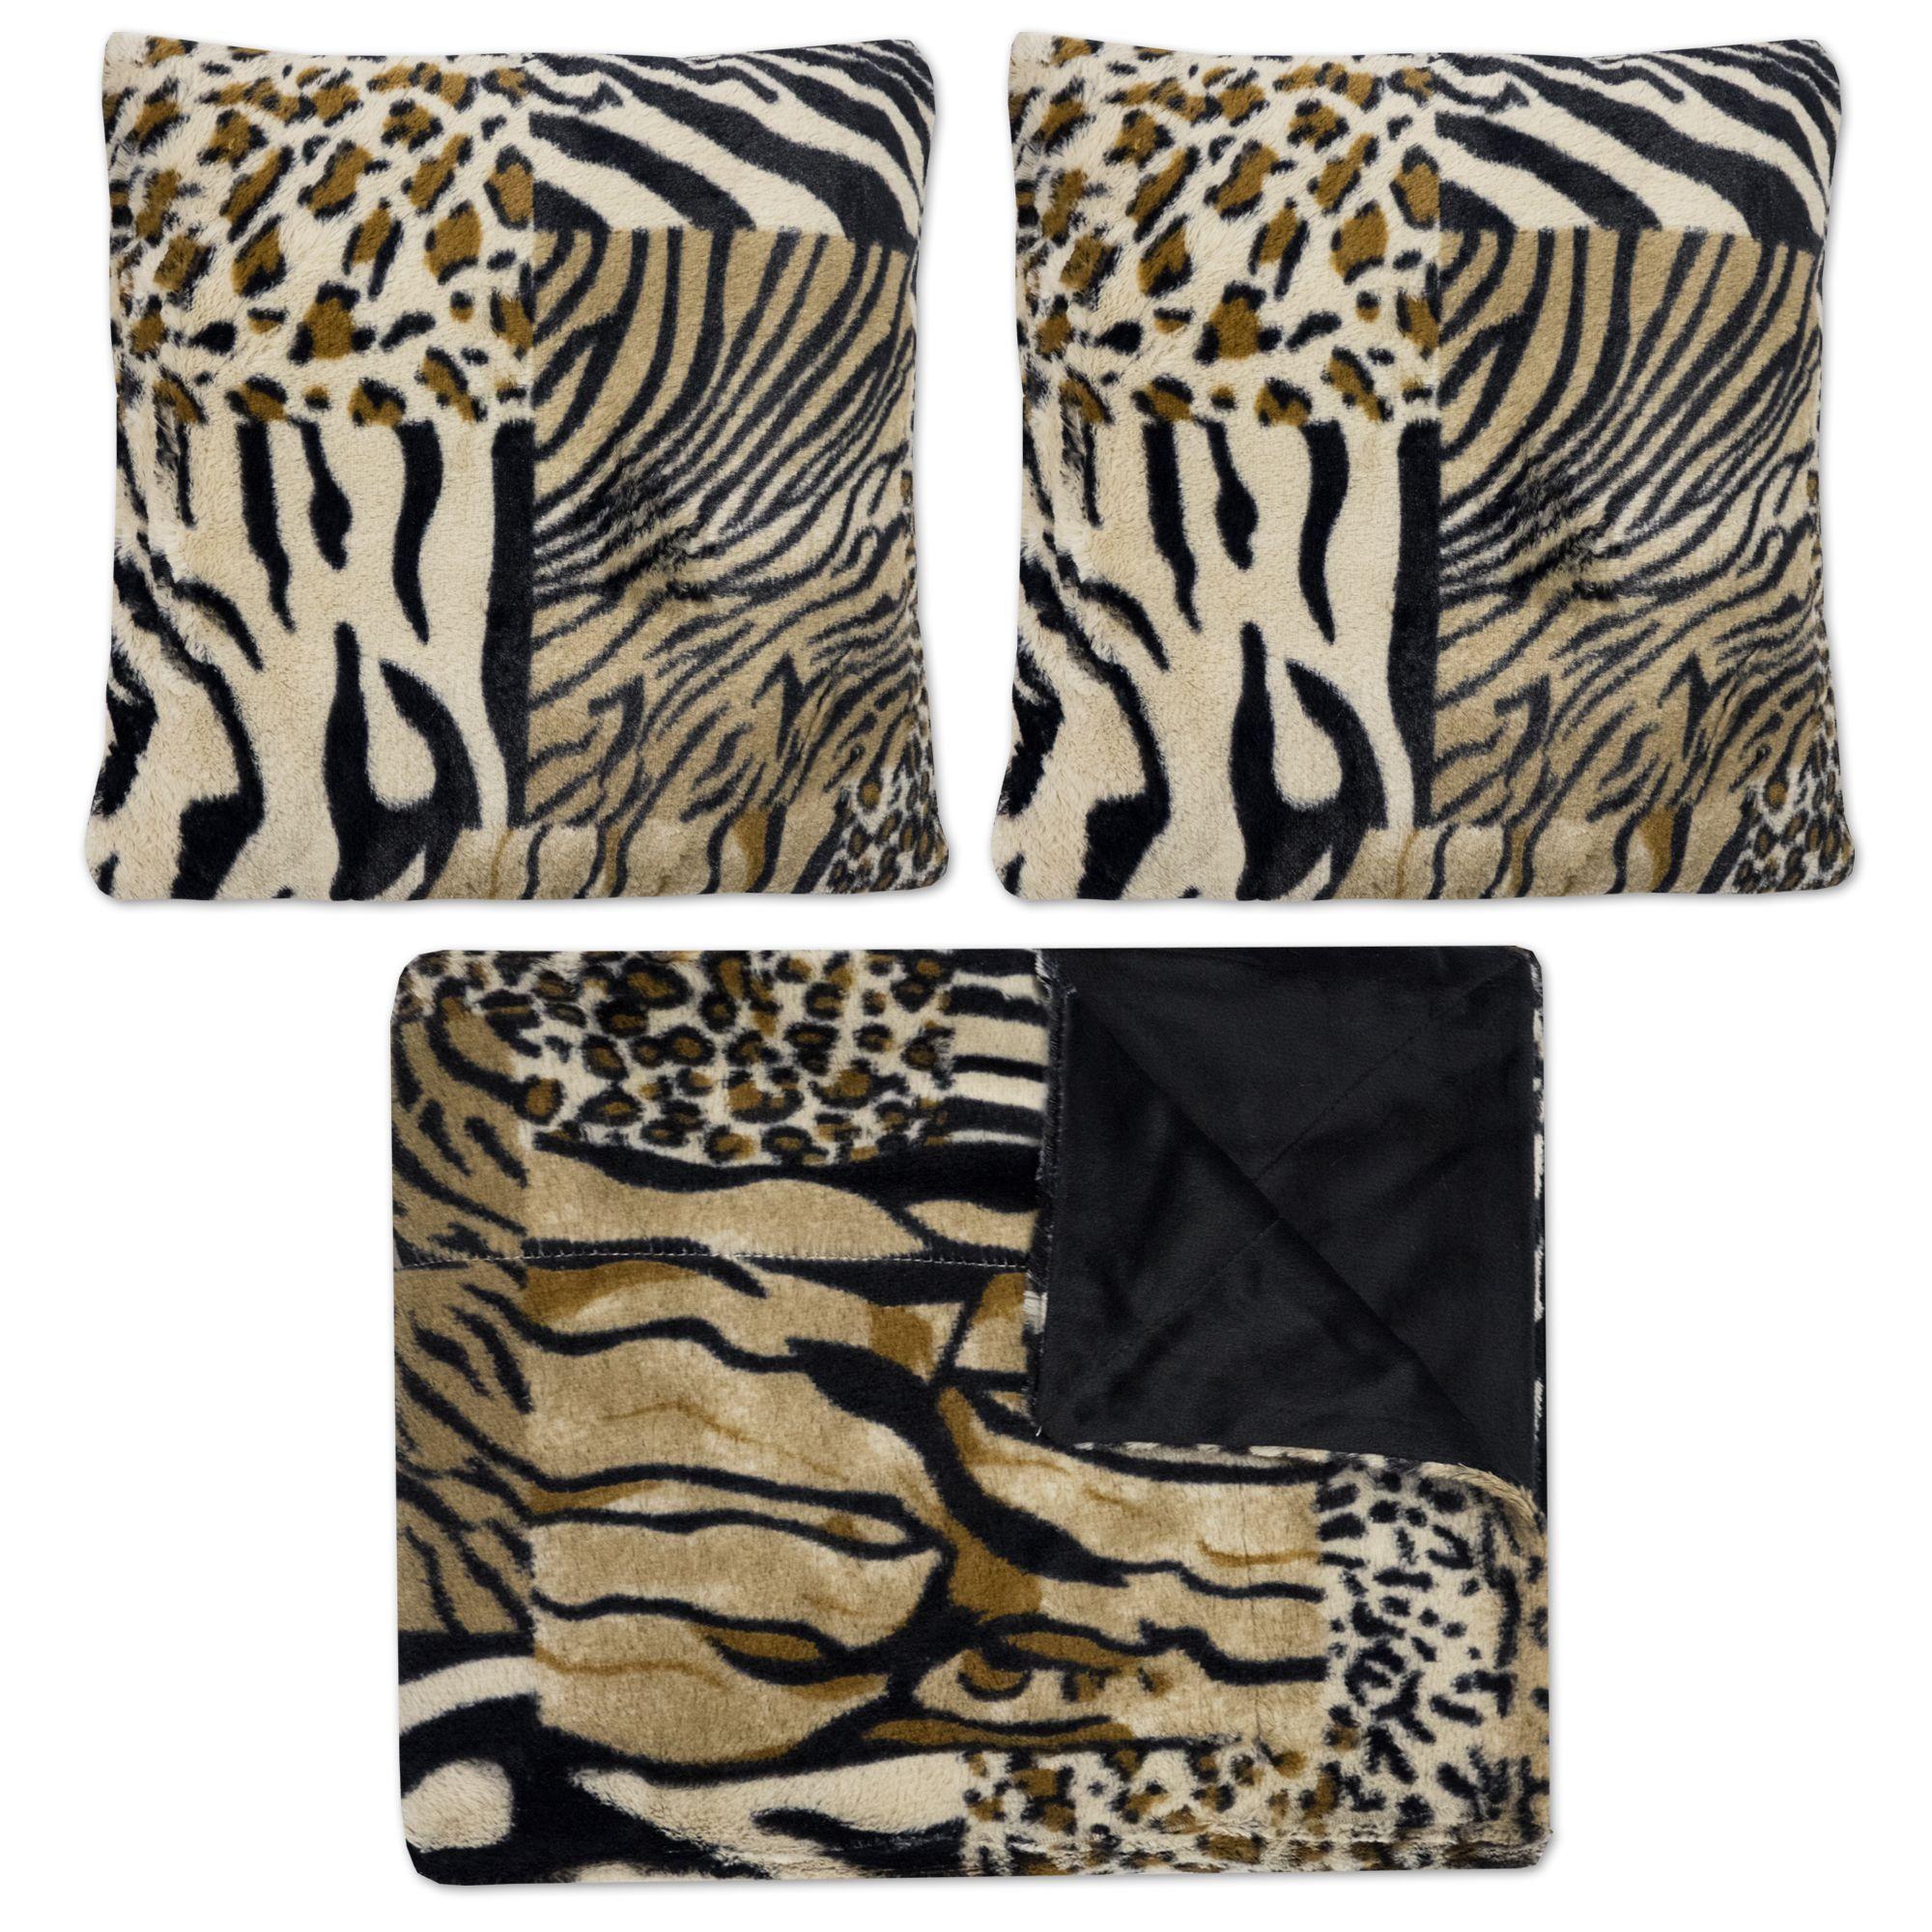 Mixed Exotic Animal Print 3 Piece Plush Faux Fur